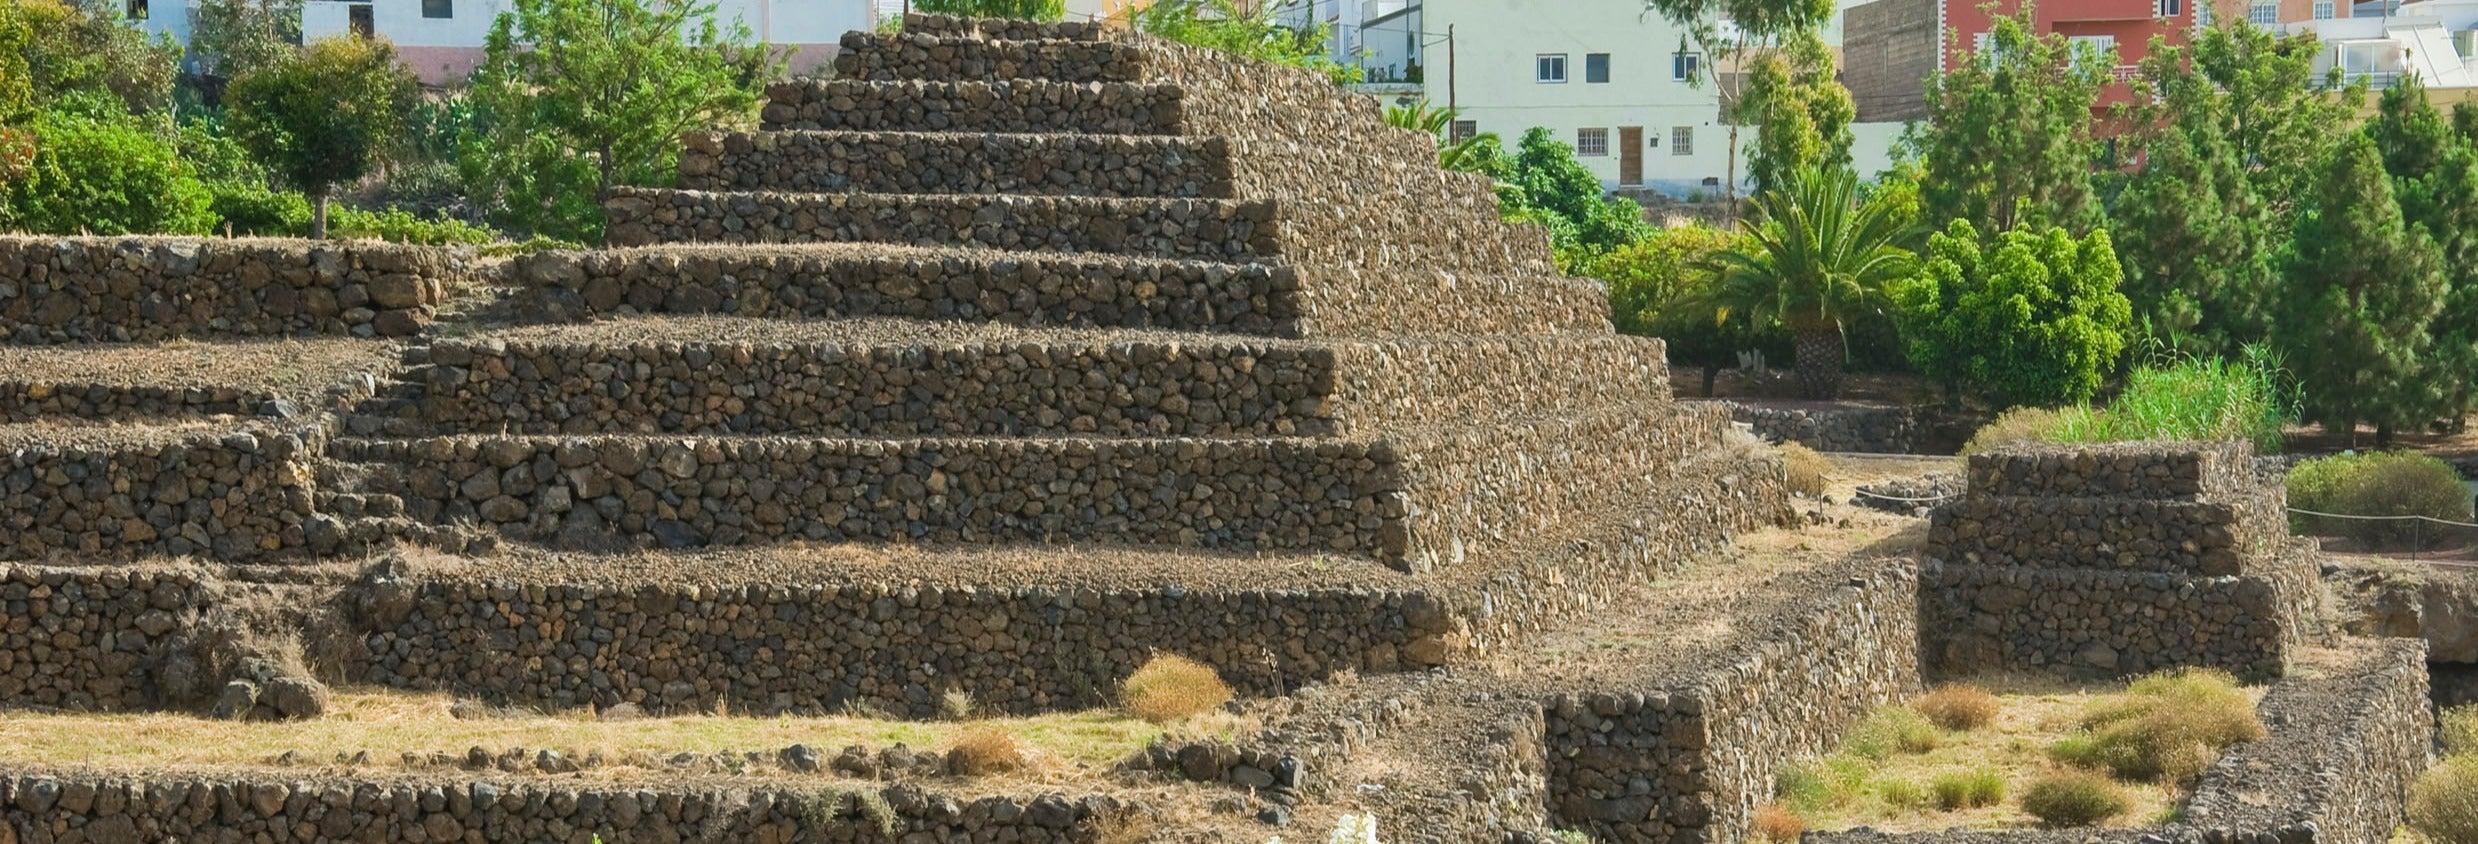 Ingresso das Pirâmides de Güímar